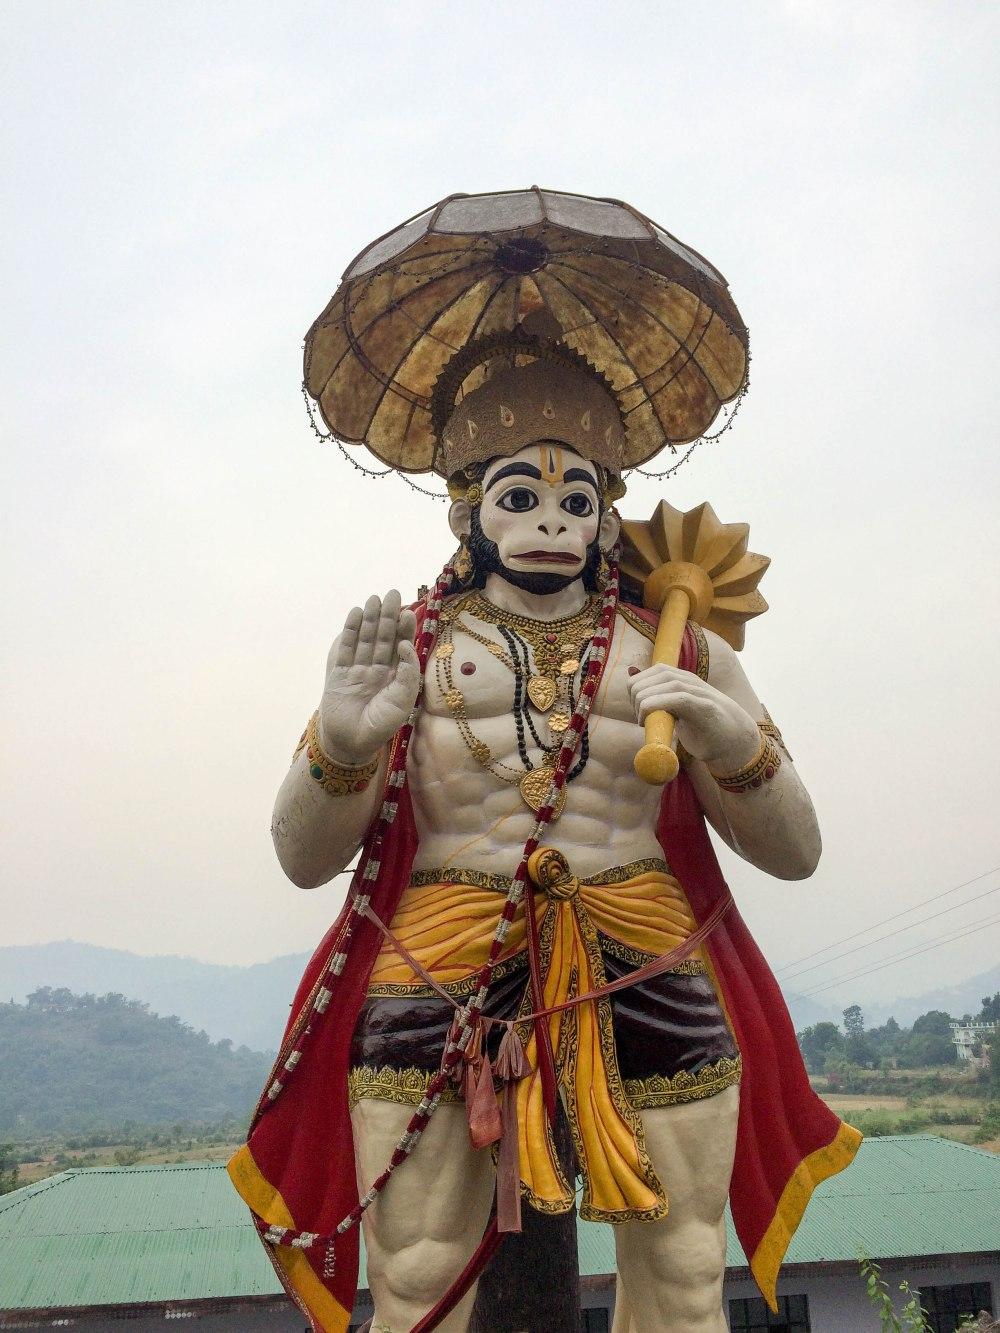 Near Naukuchiatal Temple